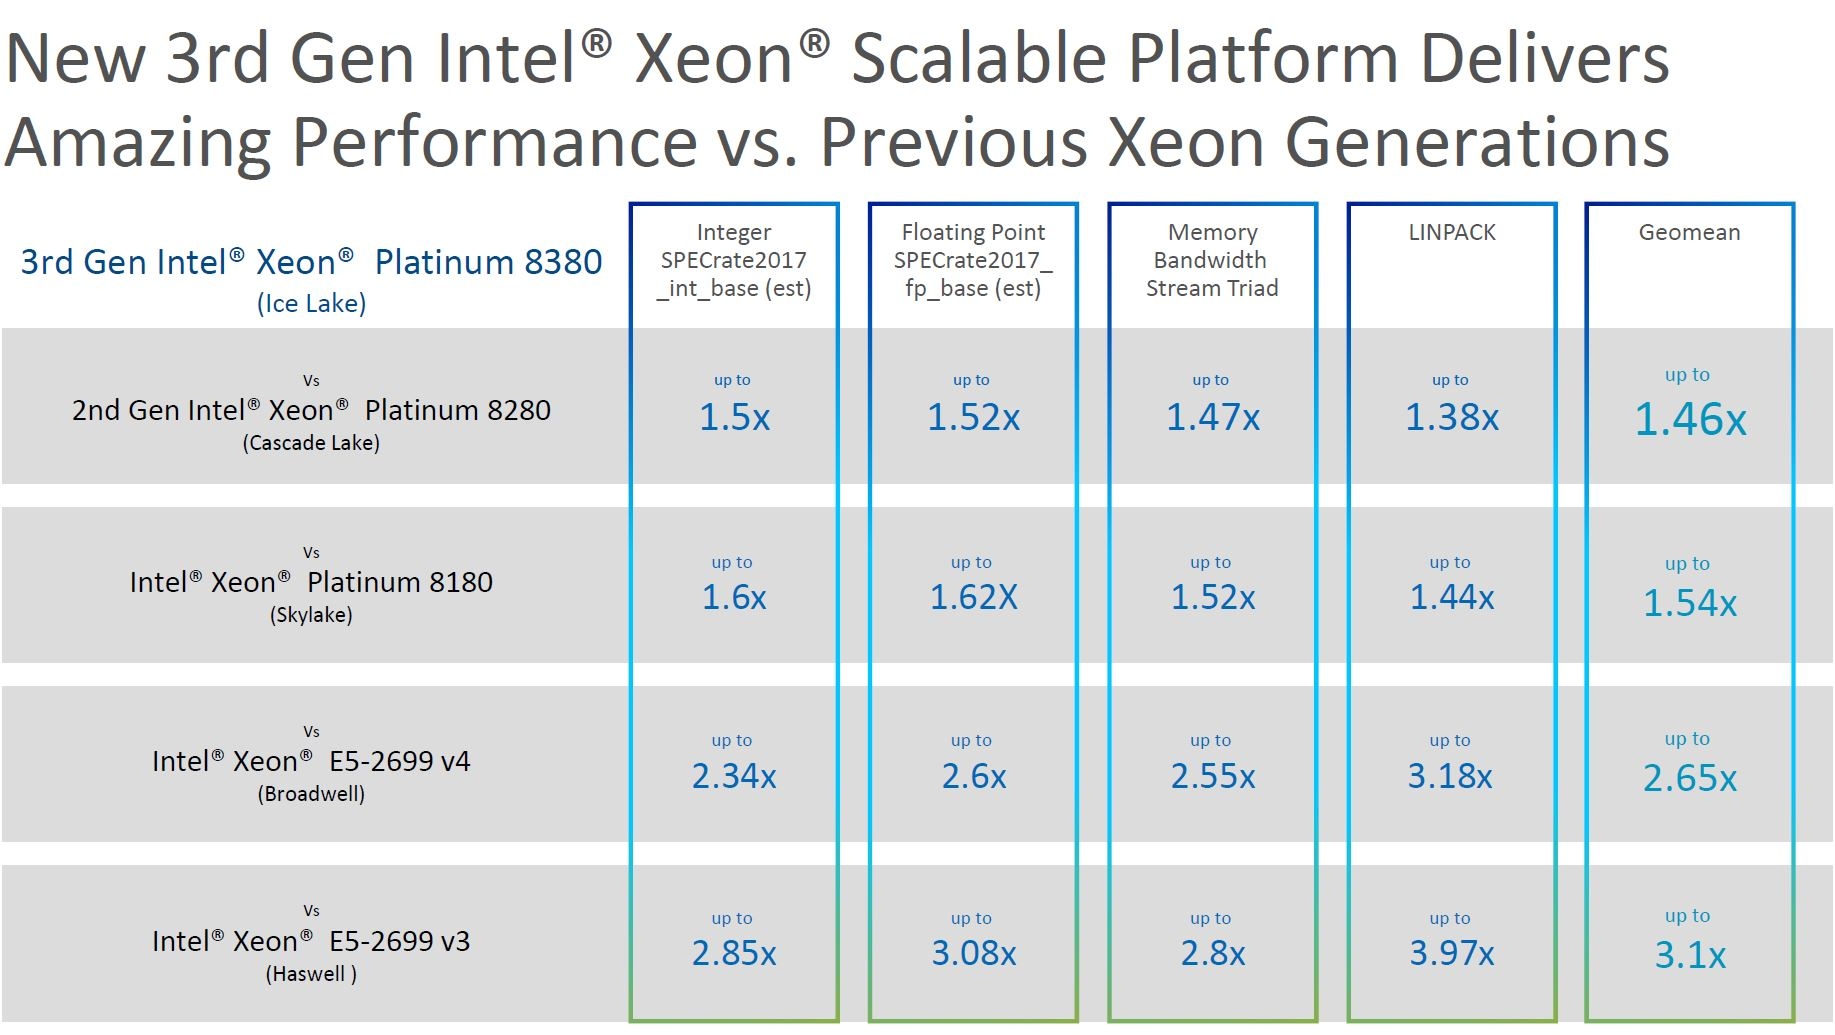 3rd Generation Intel Xeon Scalable Ice Lake Platform 2